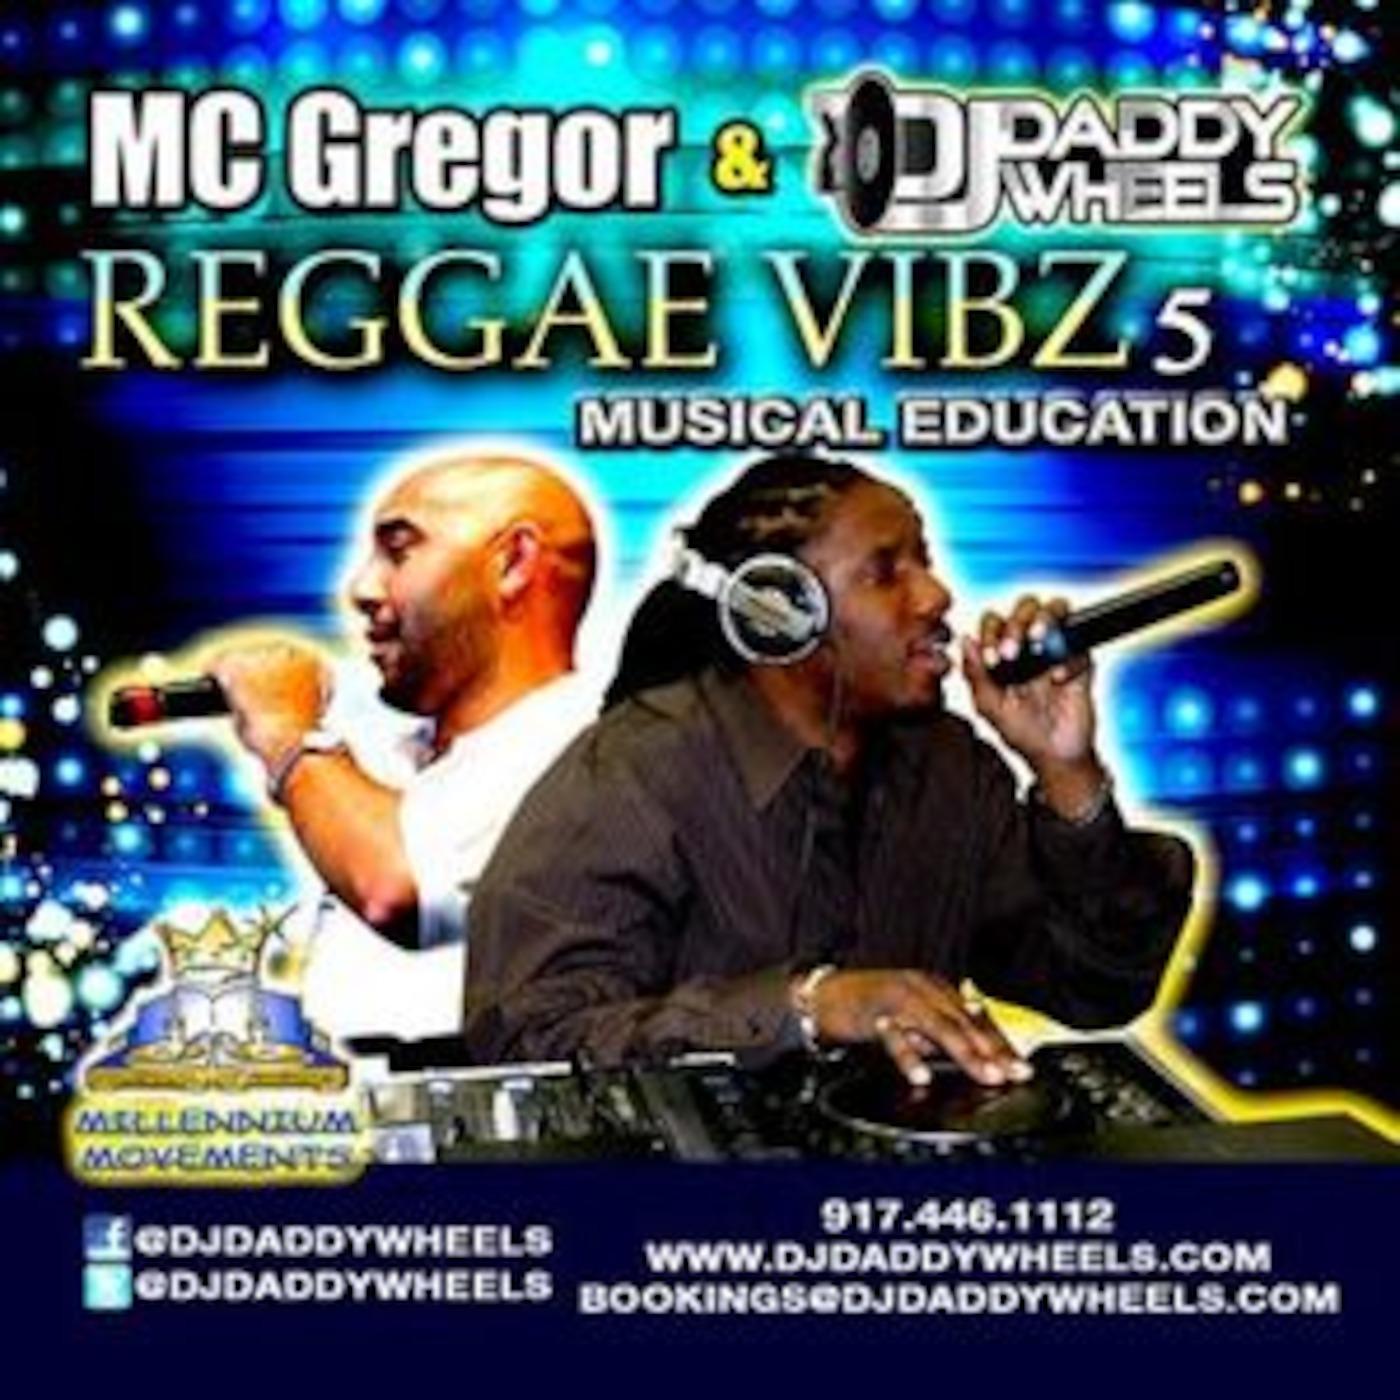 REGGAE VIBZ 5: Musical Education - DJ DADDYWHEELS DJ